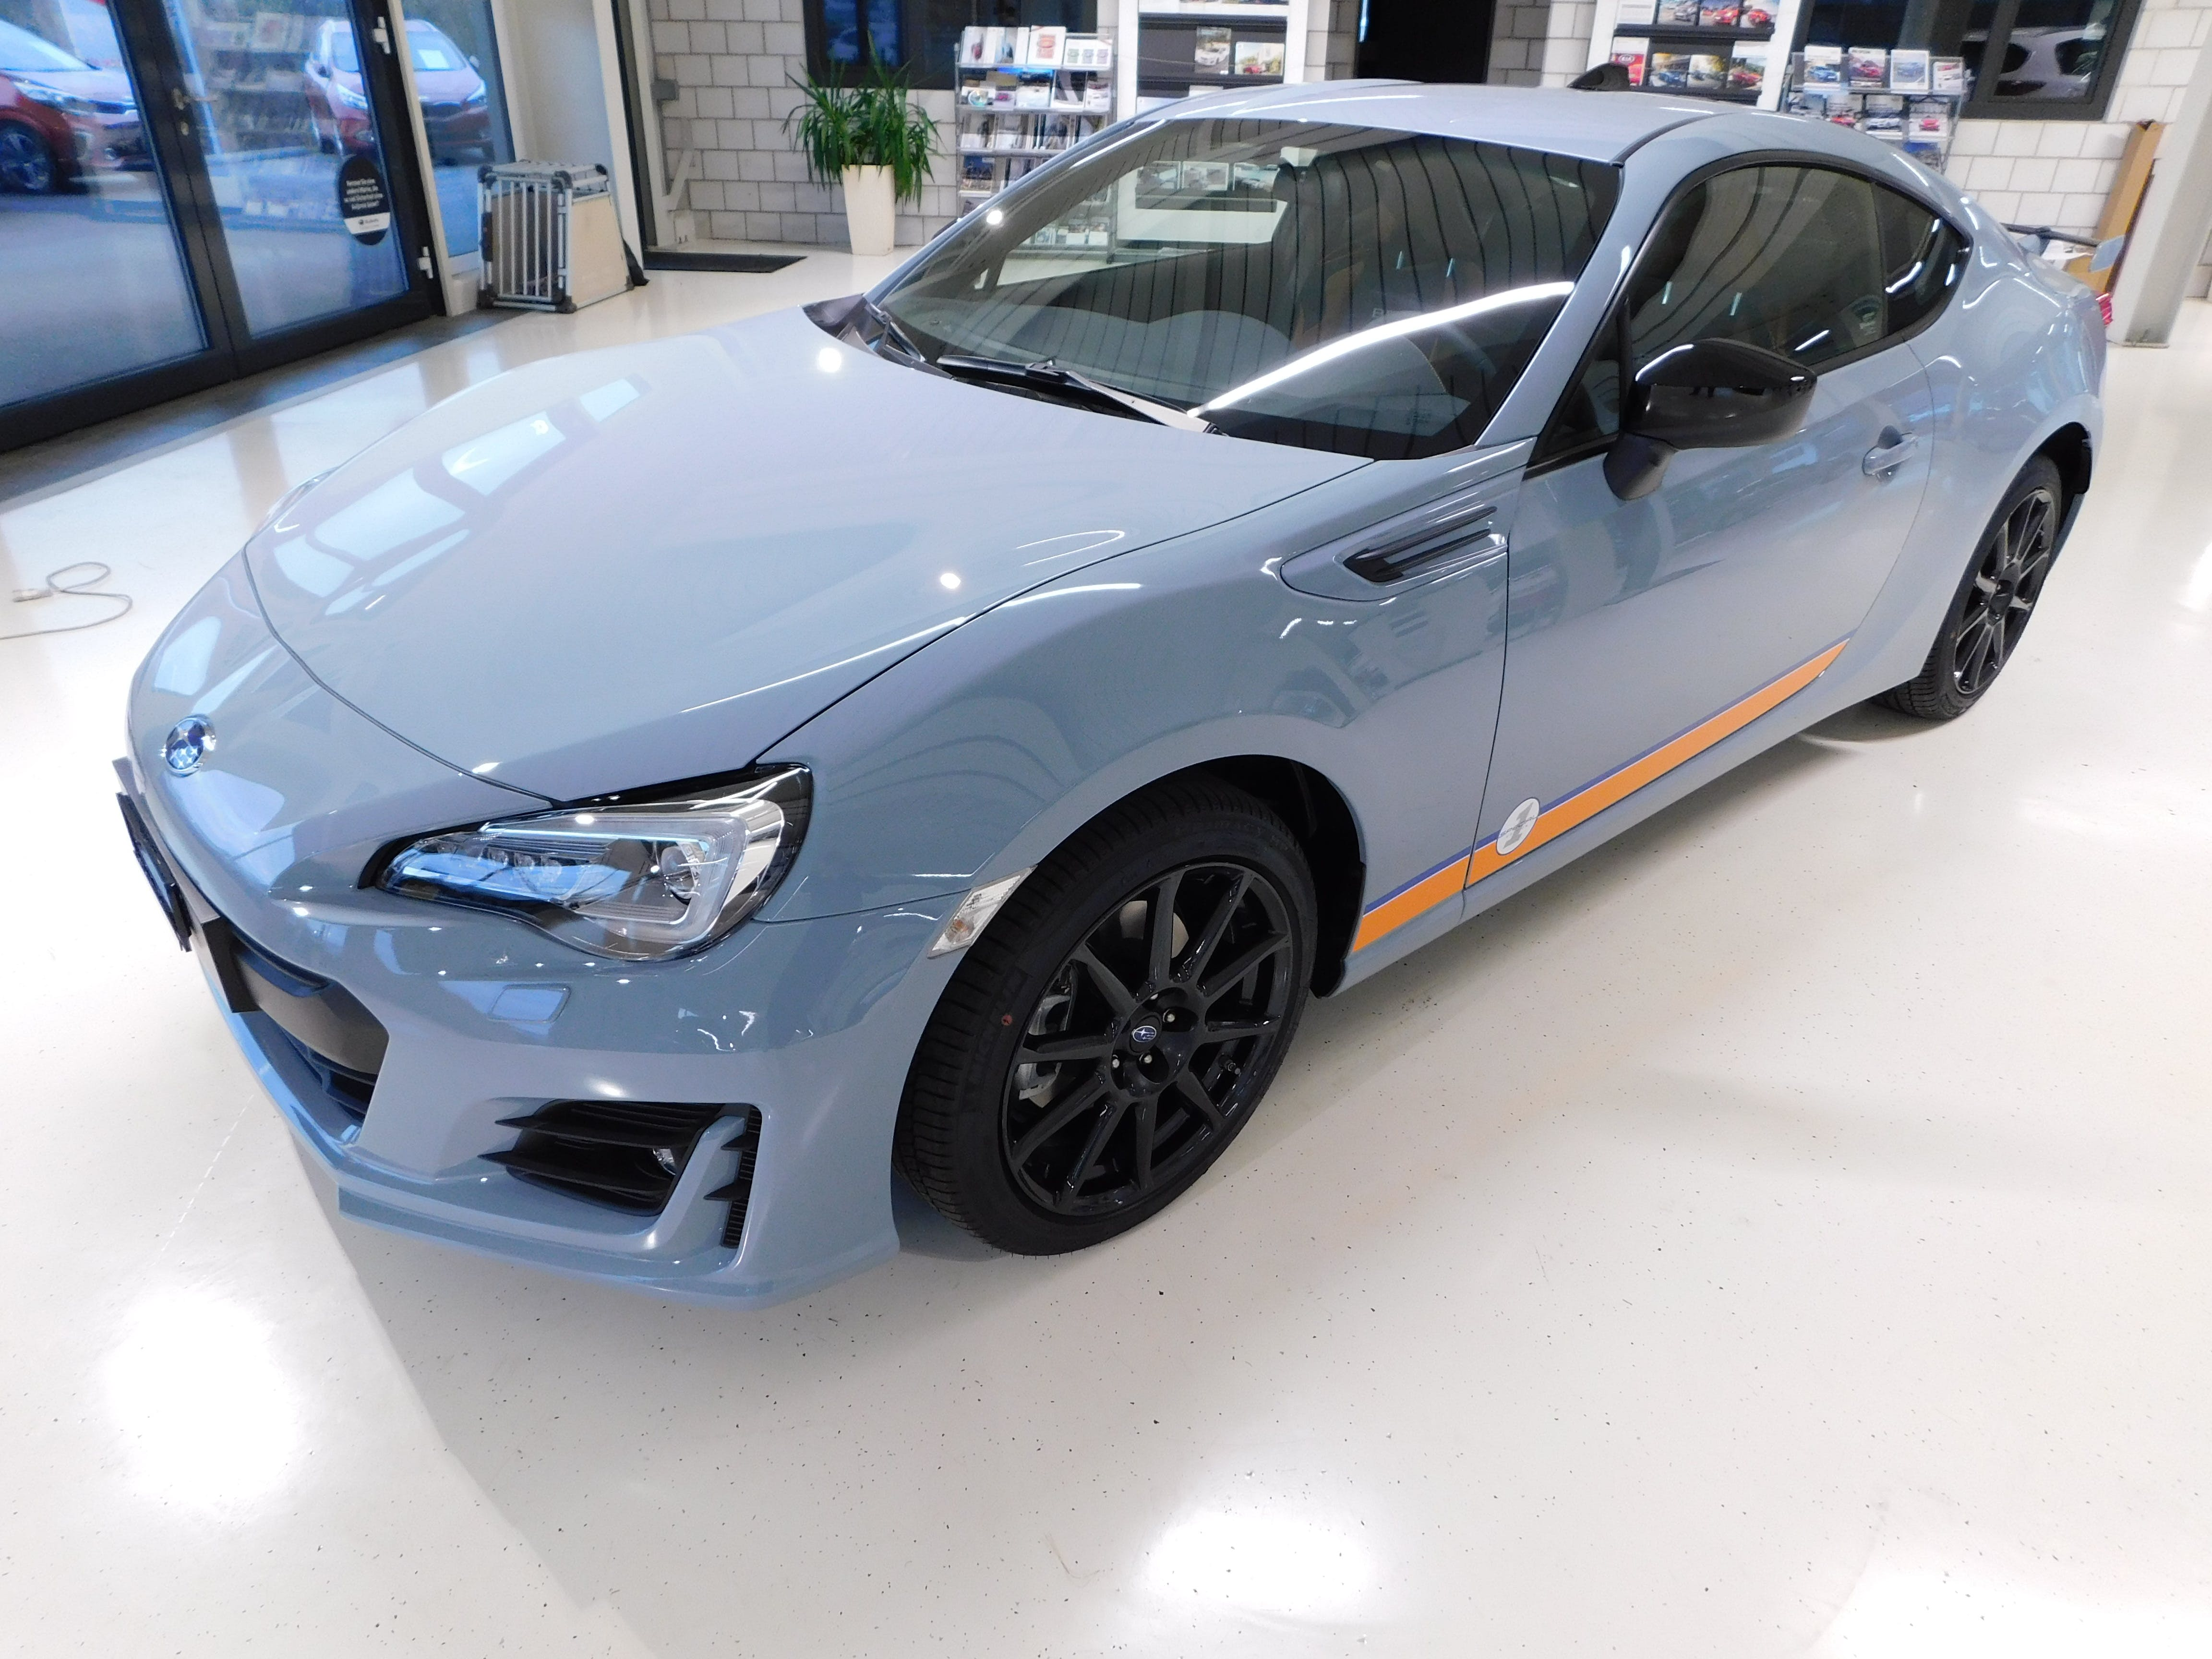 coupe Subaru BRZ 2.0R Special